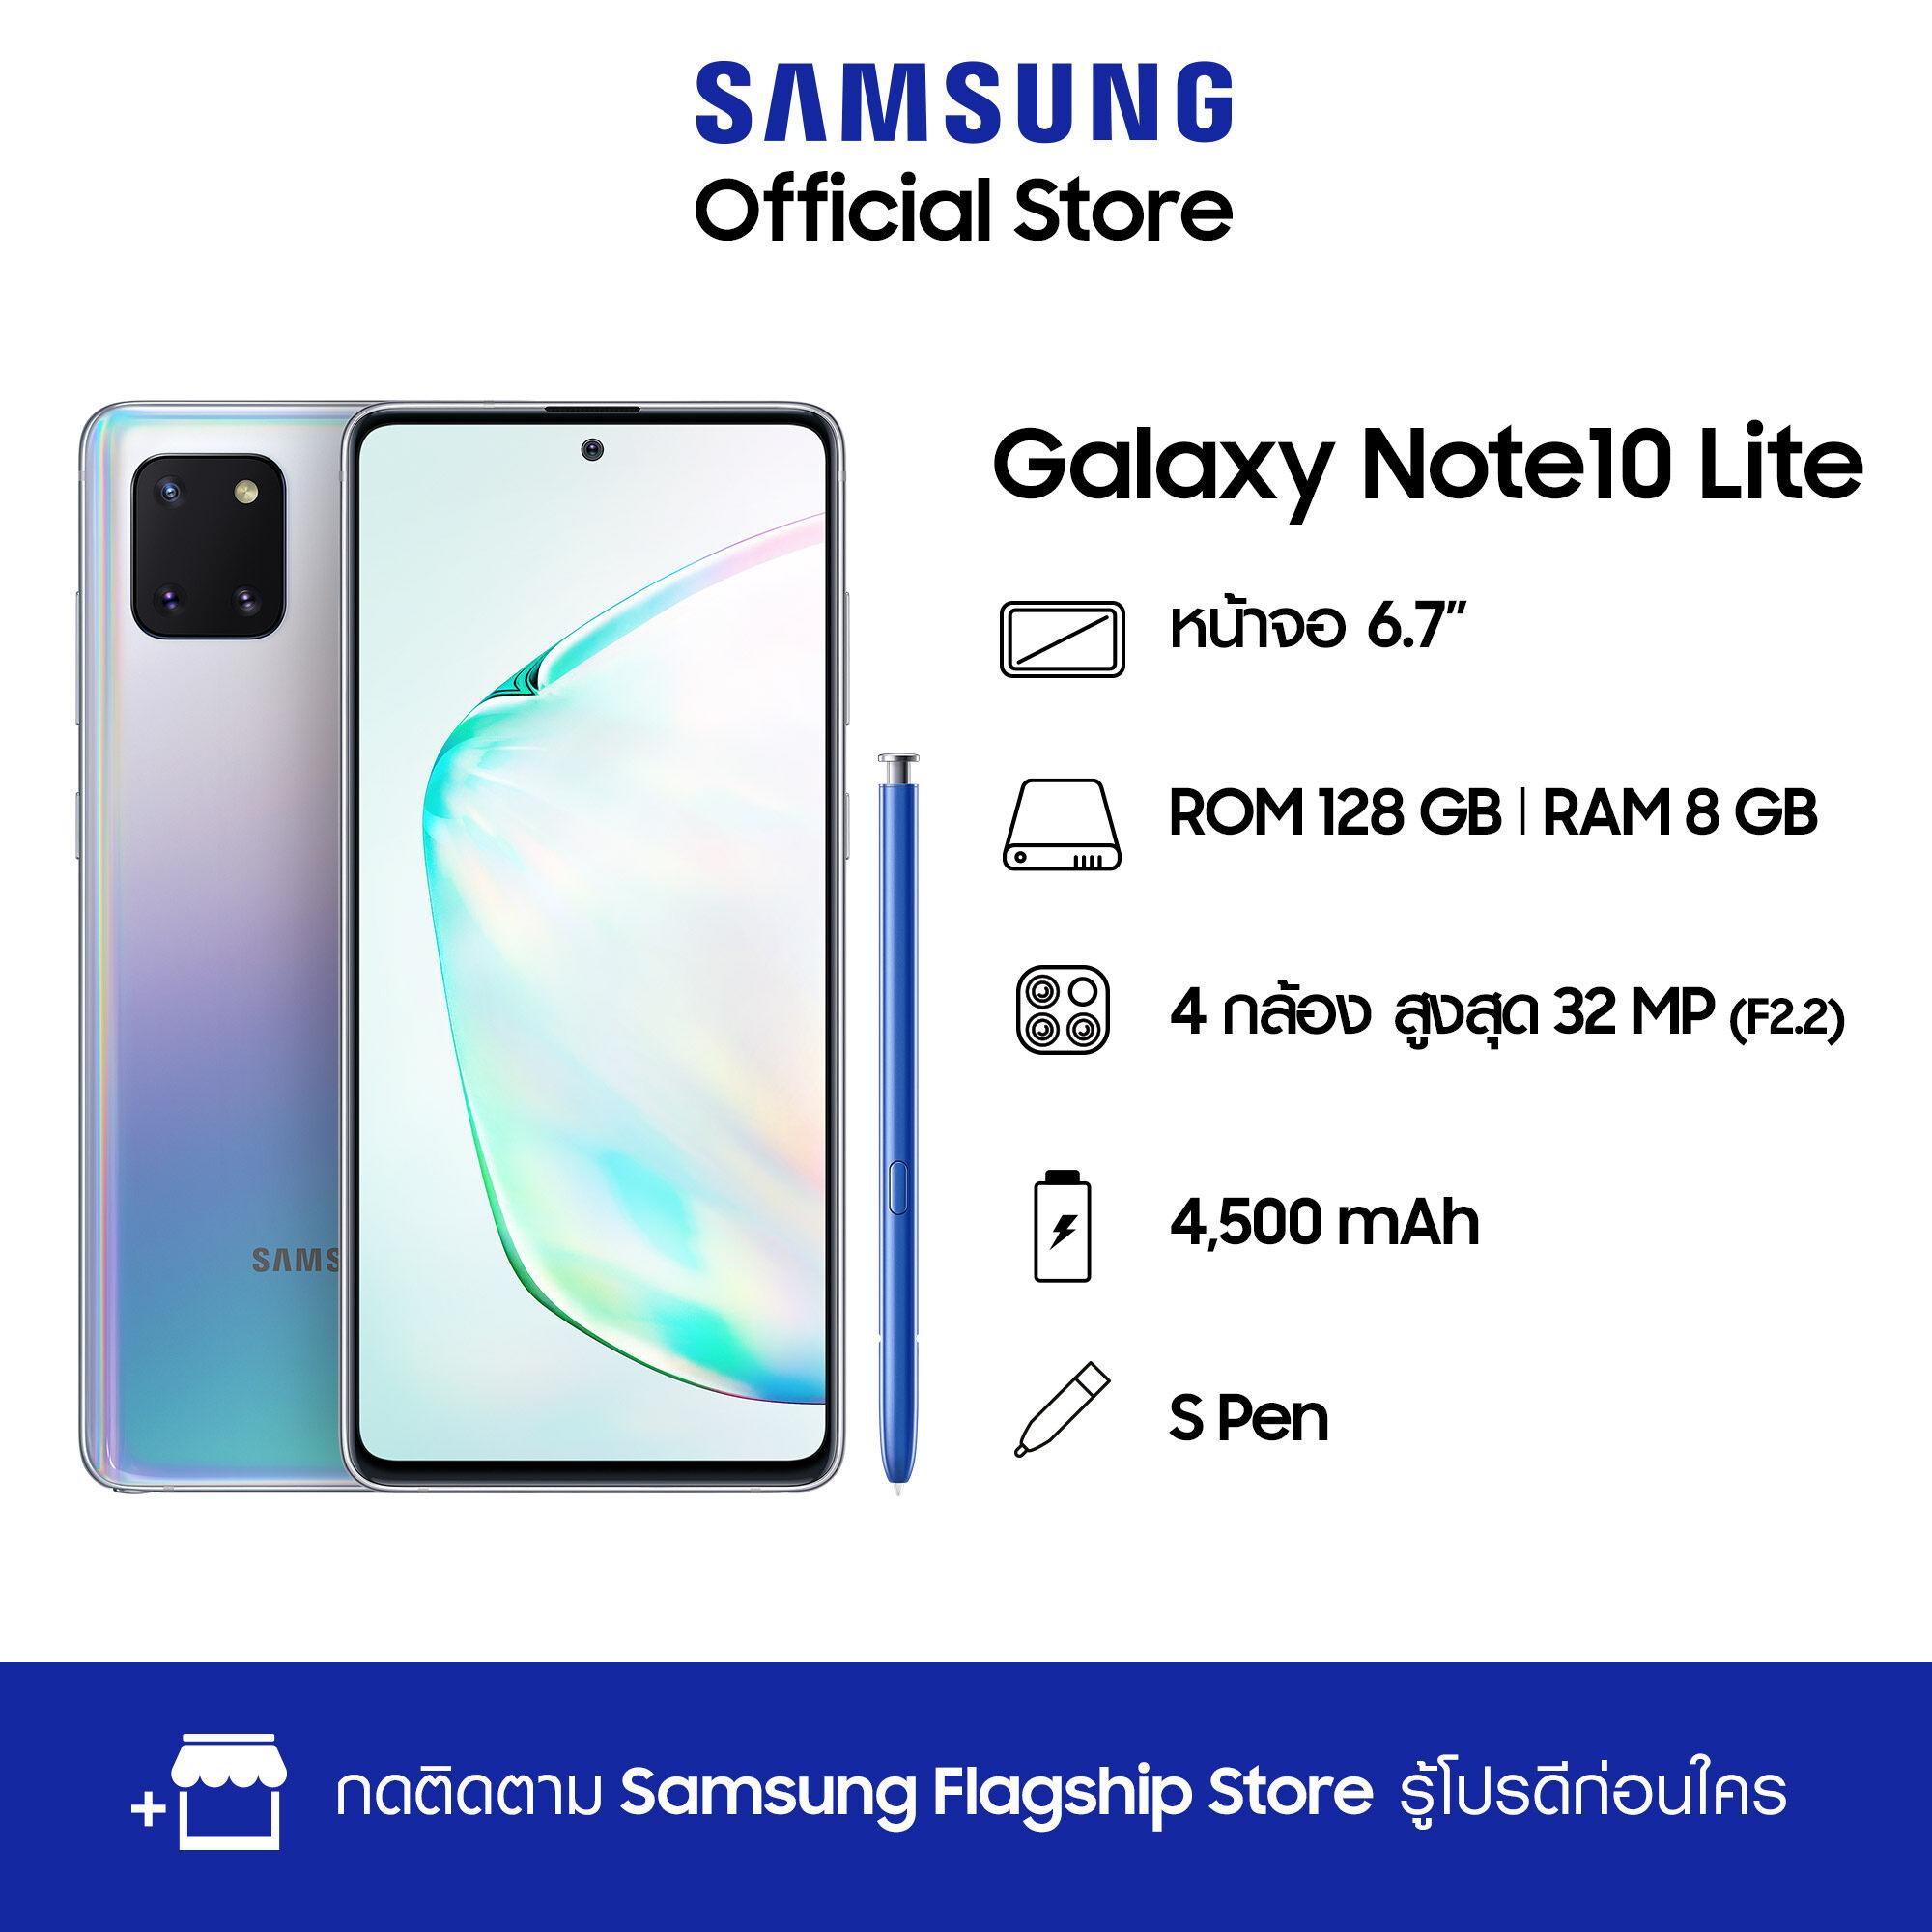 Samsung Galaxy Note 10 Lite (8/128GB) (โทรศัพท์มือถือ)